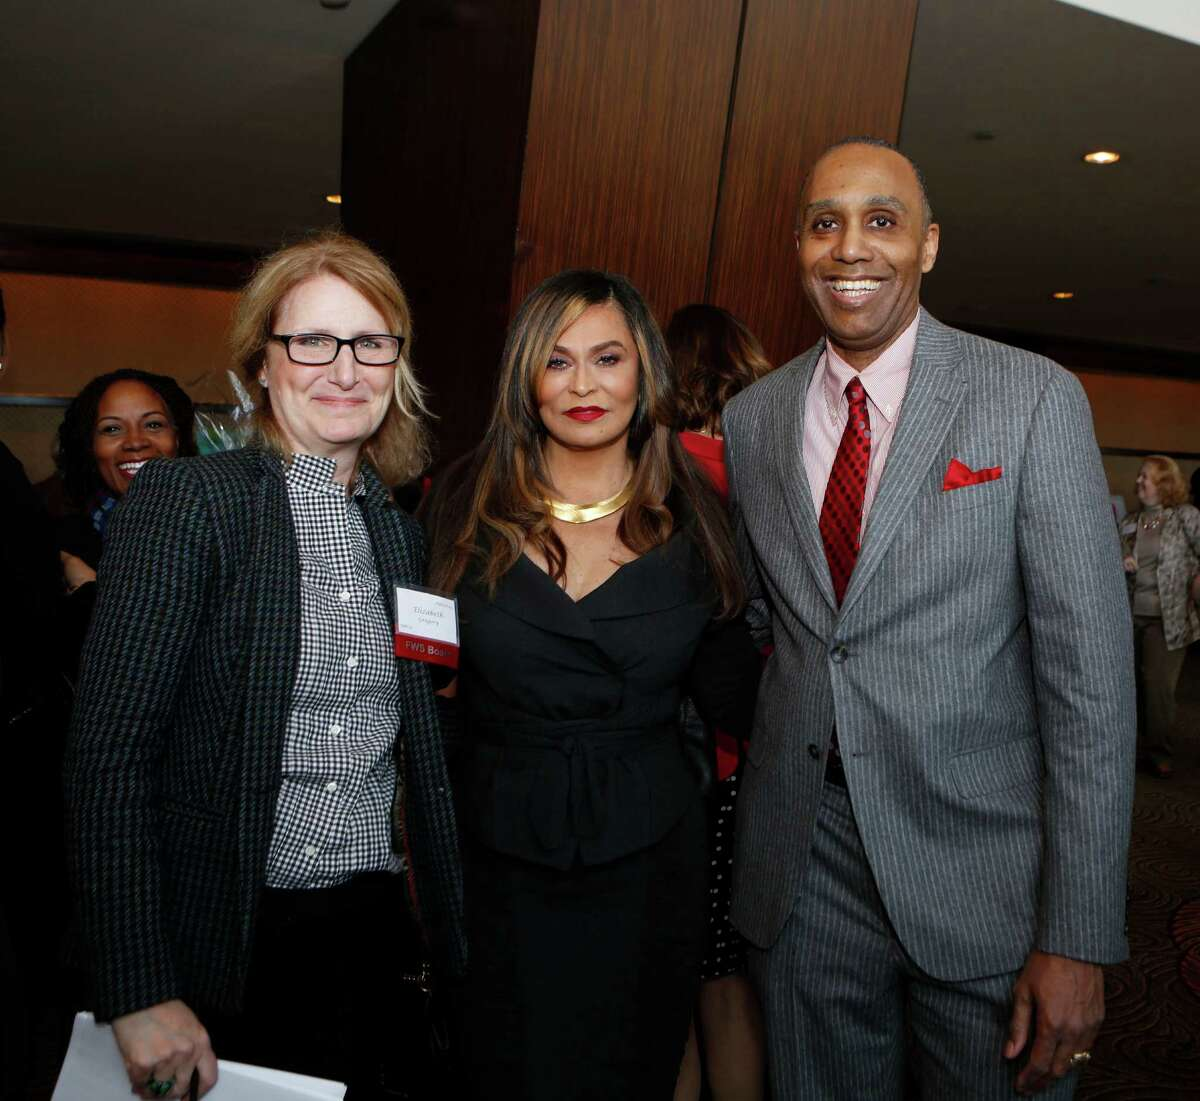 Elizabeth Gregory, left, Tina Knowles and Leonard Baynes